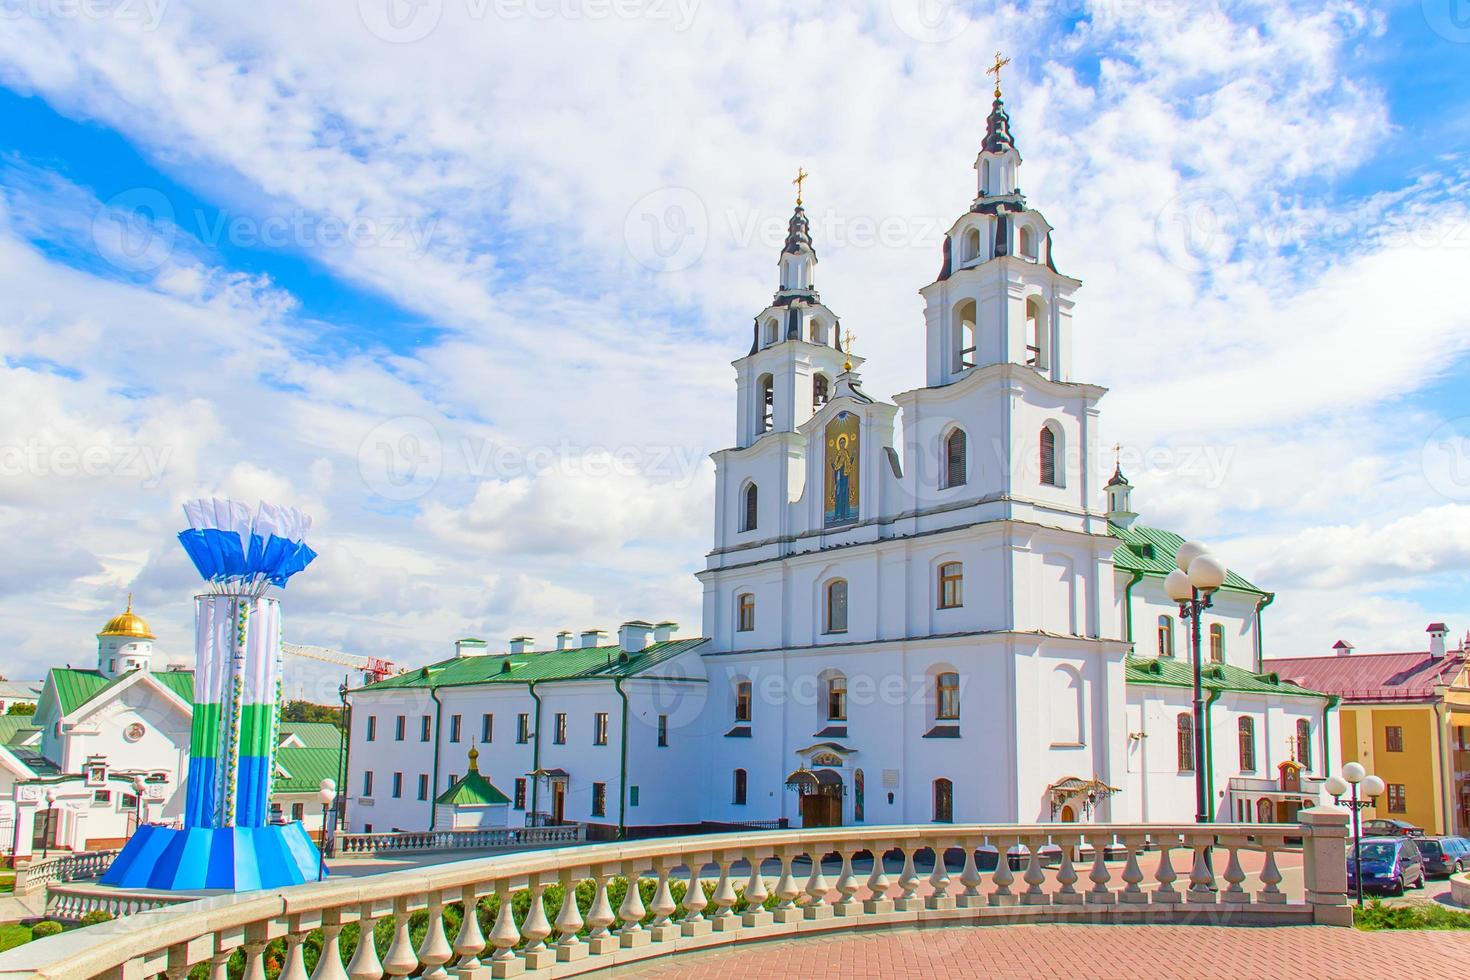 catedral do espírito santo em minsk, bielorrússia. foto